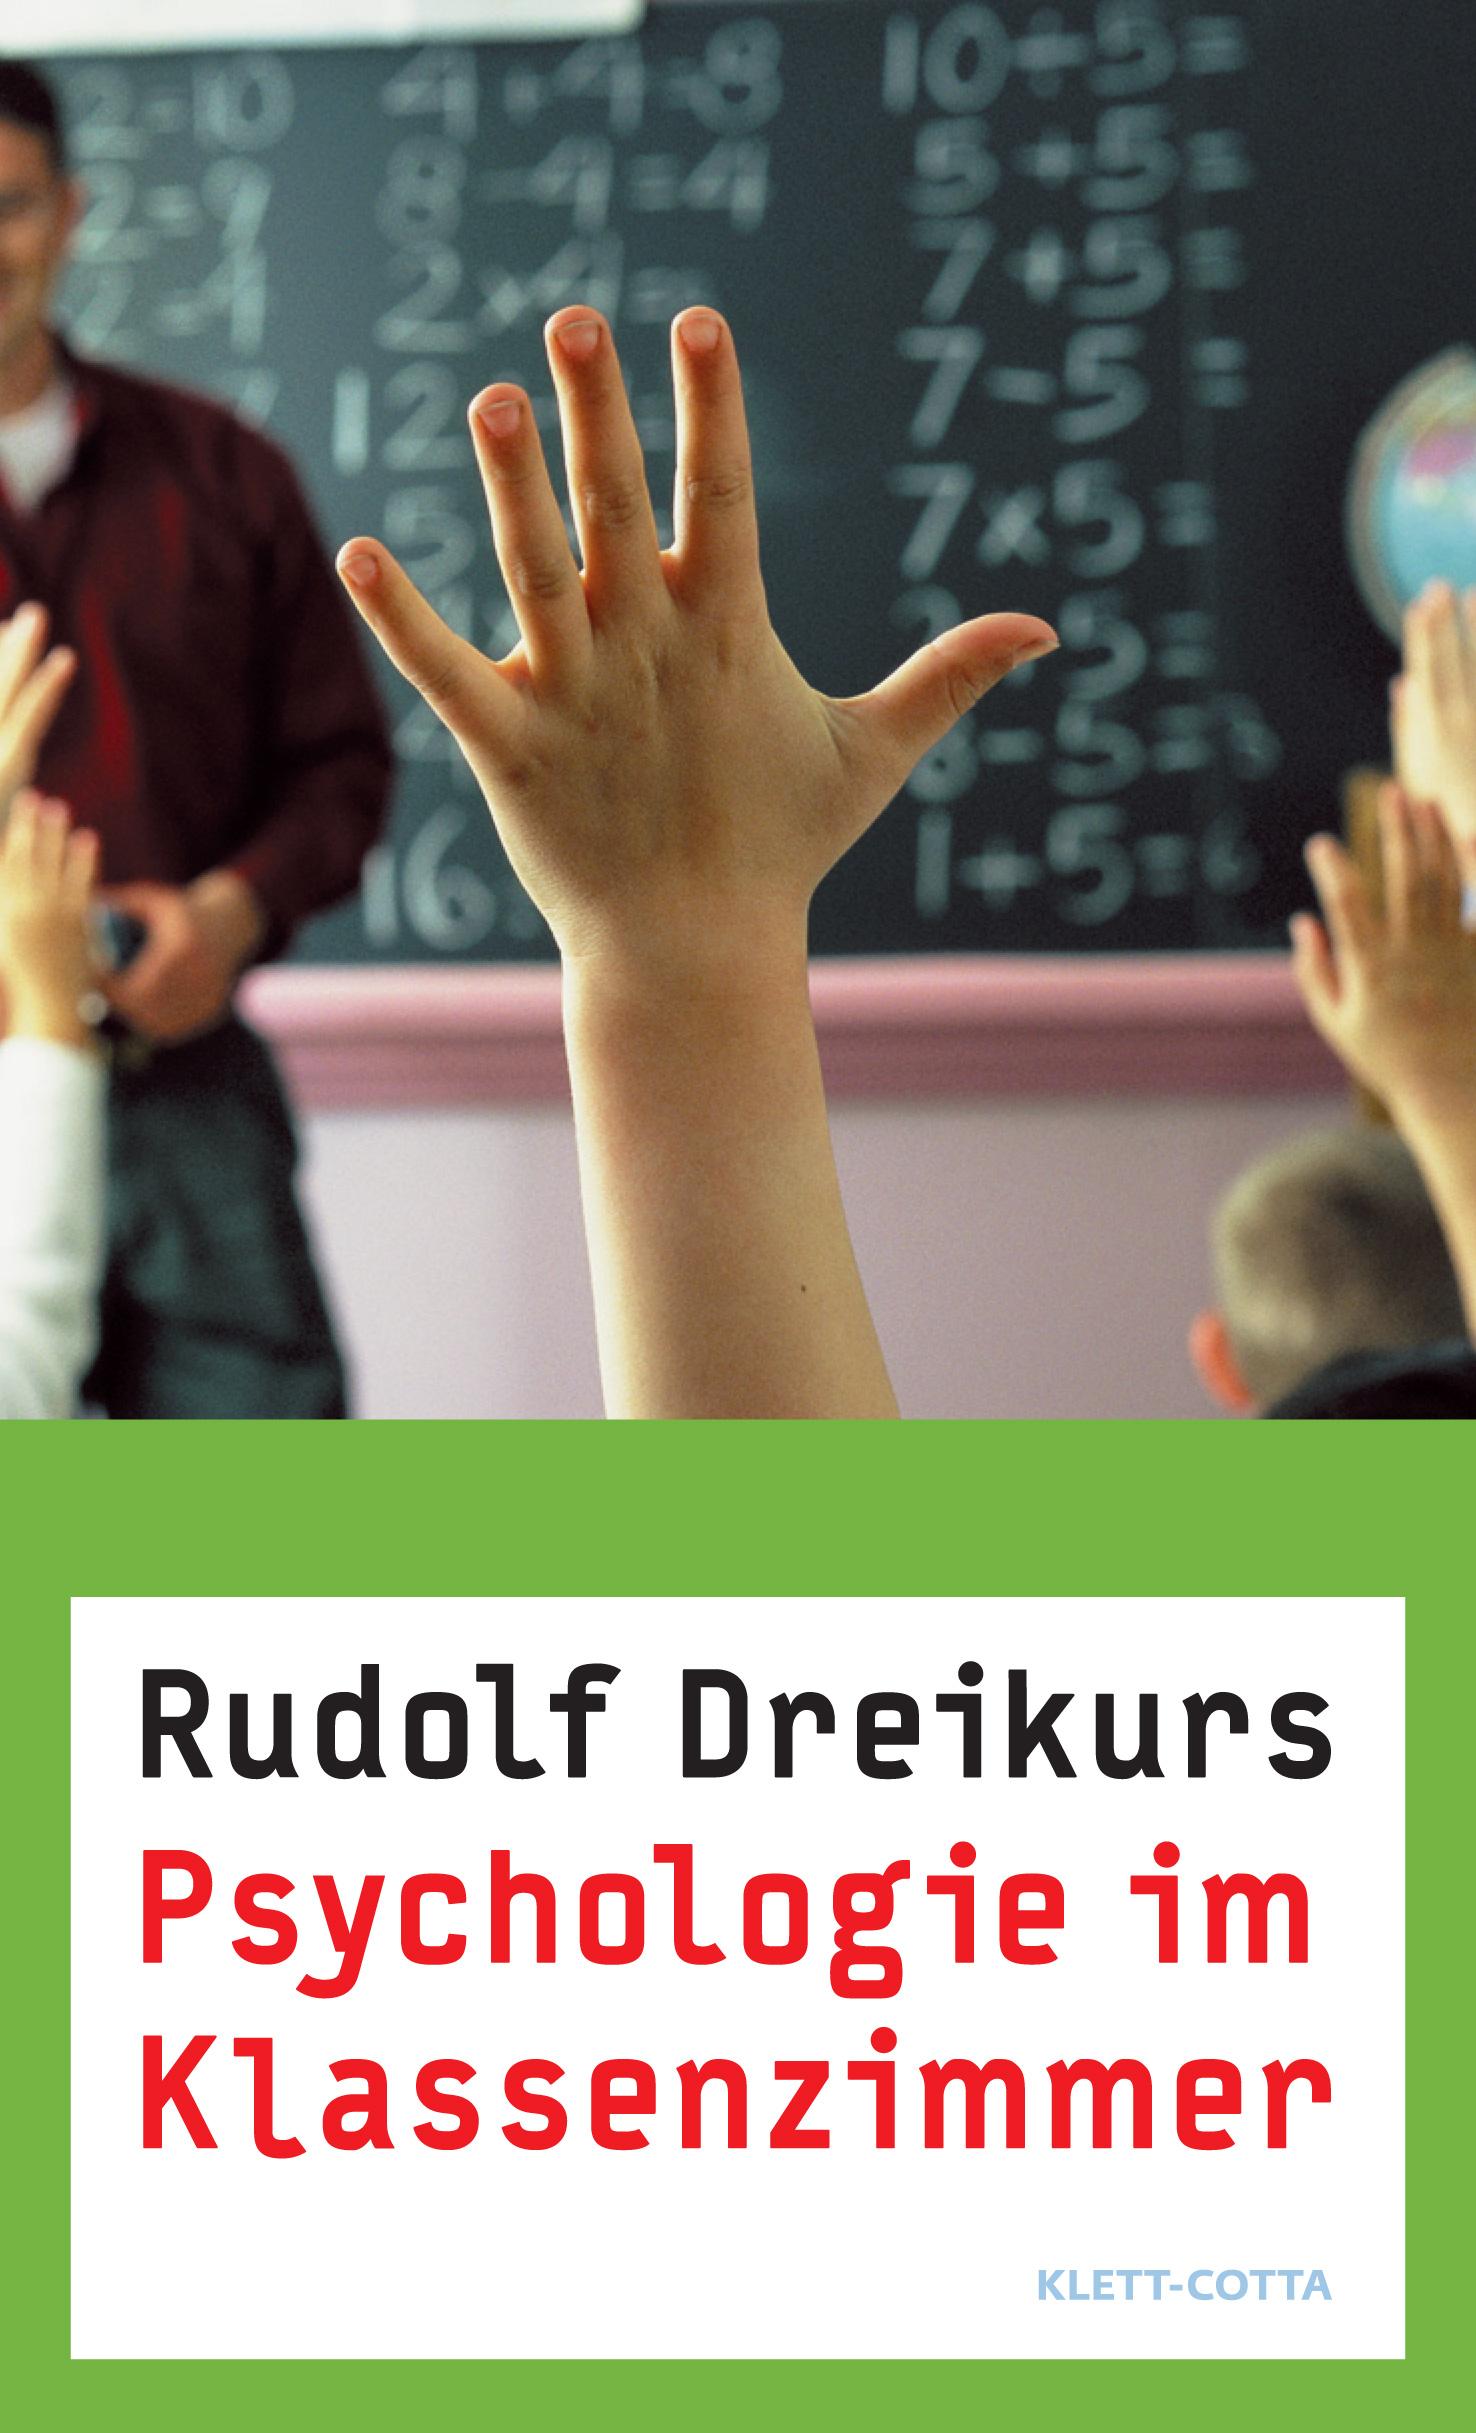 Psychologie im Klassenzimmer - Rudolf Dreikurs